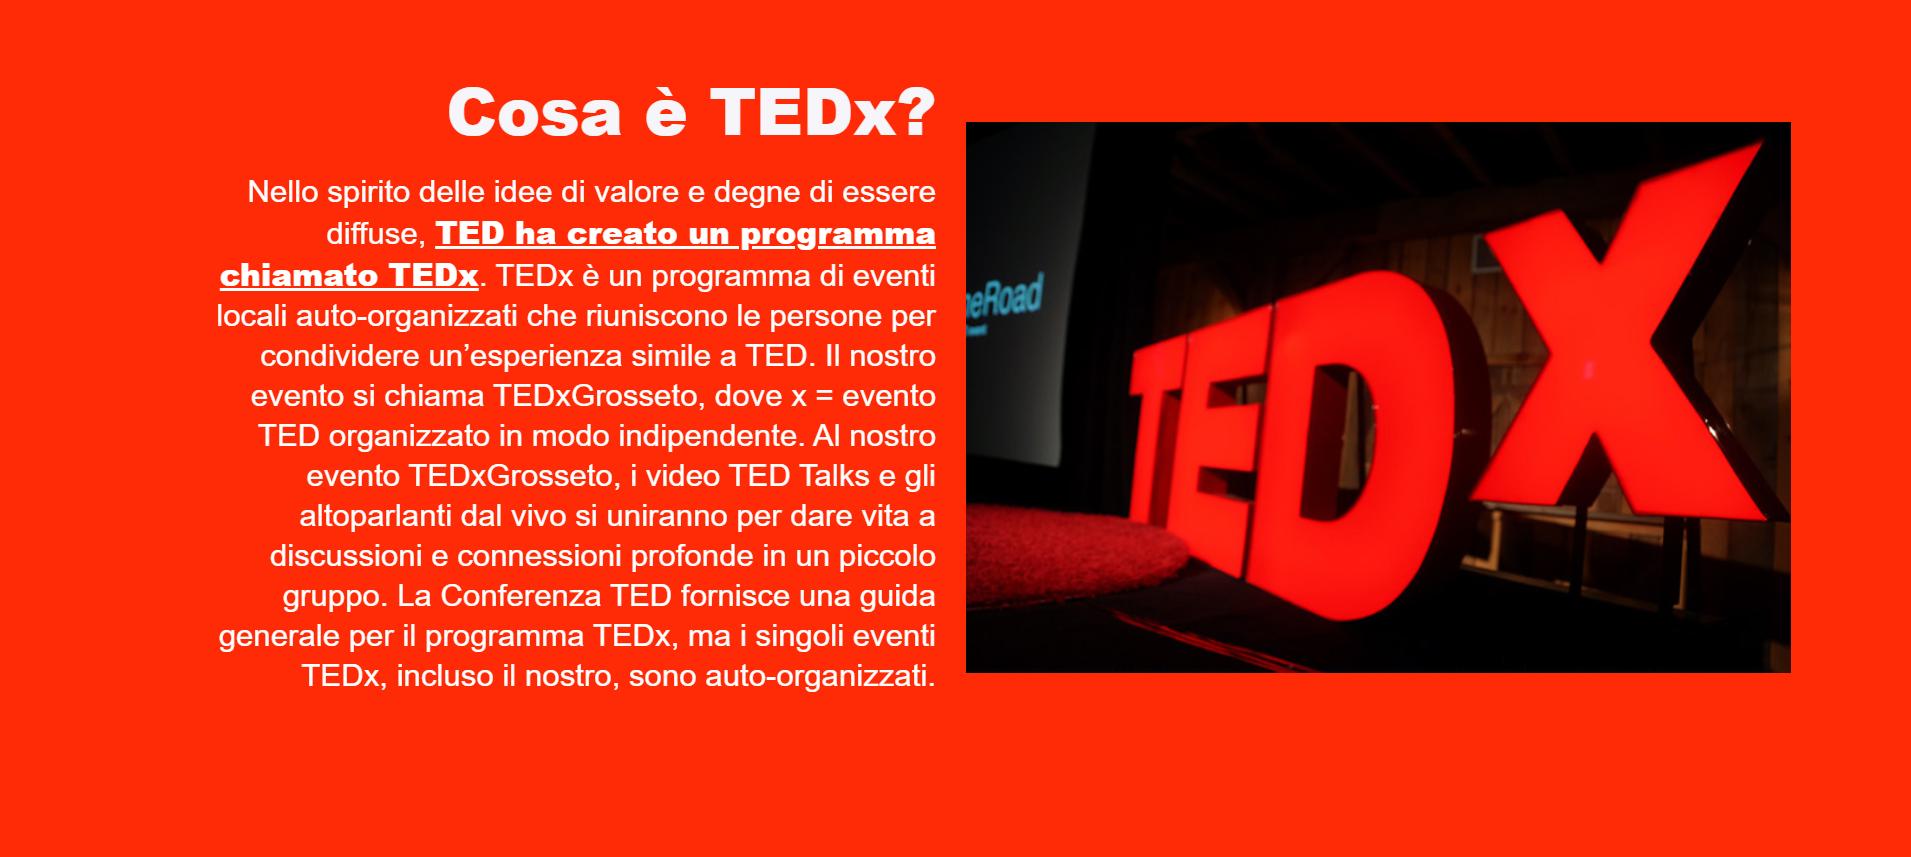 Cosa è TEDx?